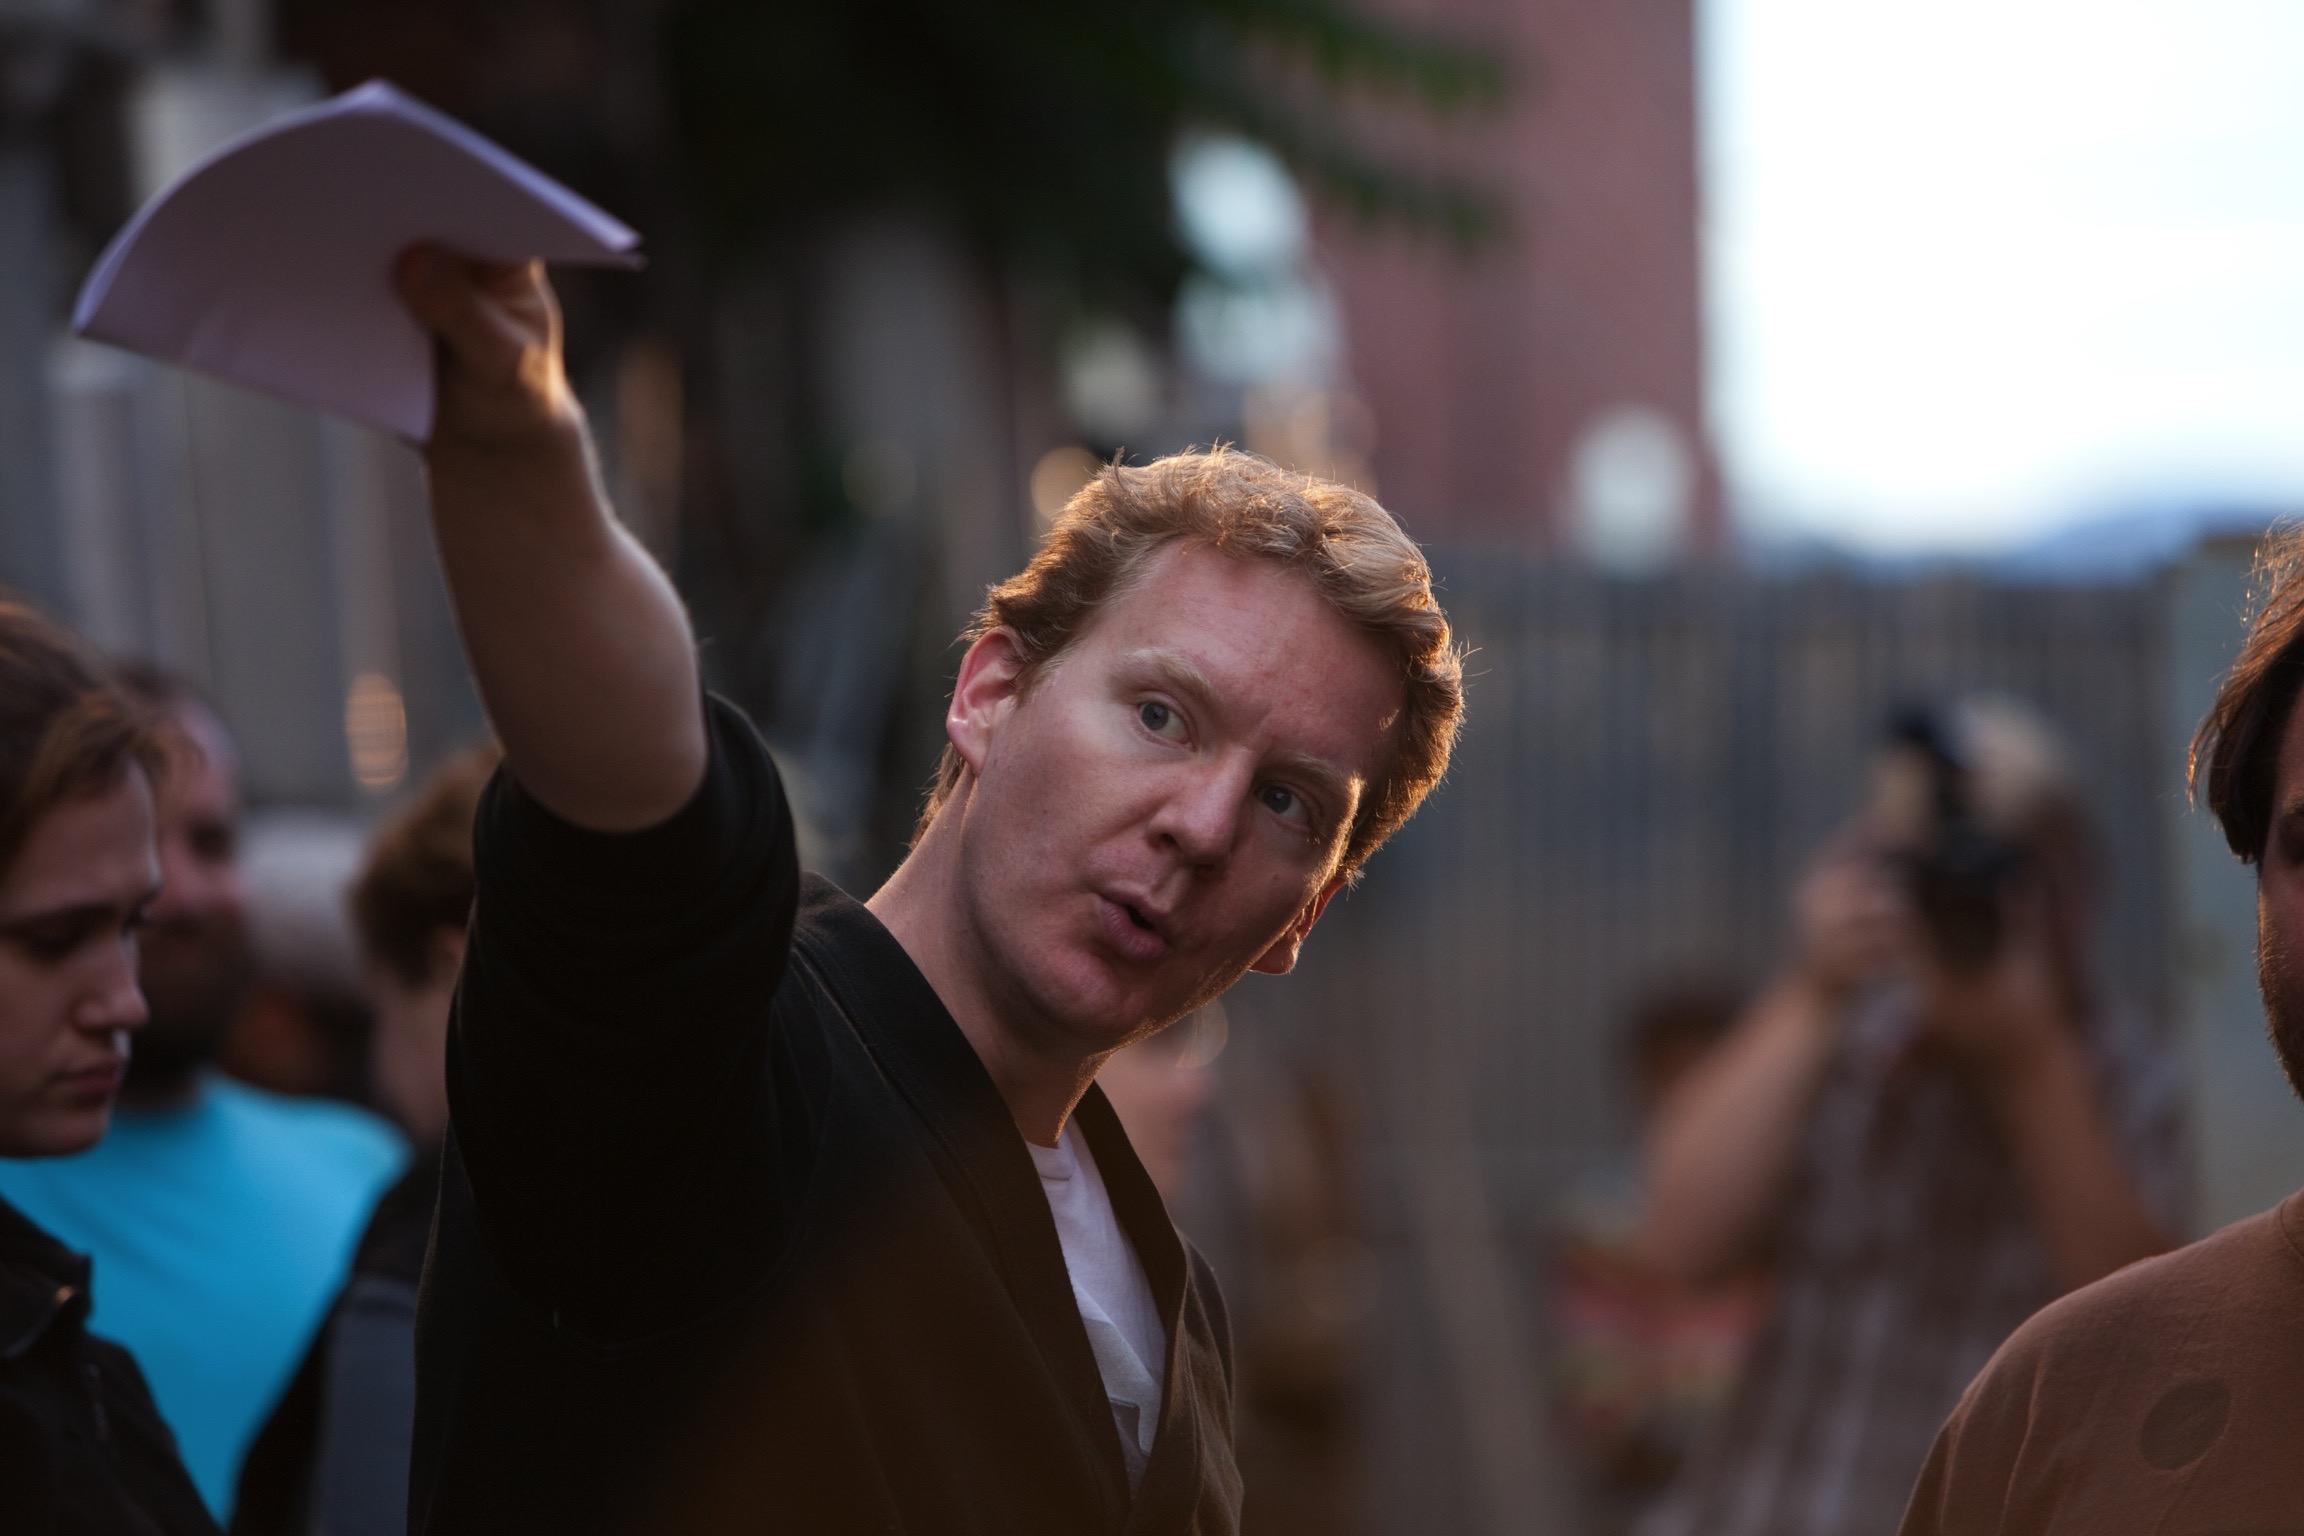 Ryan Landels in The LXD: The Legion of Extraordinary Dancers (2010)